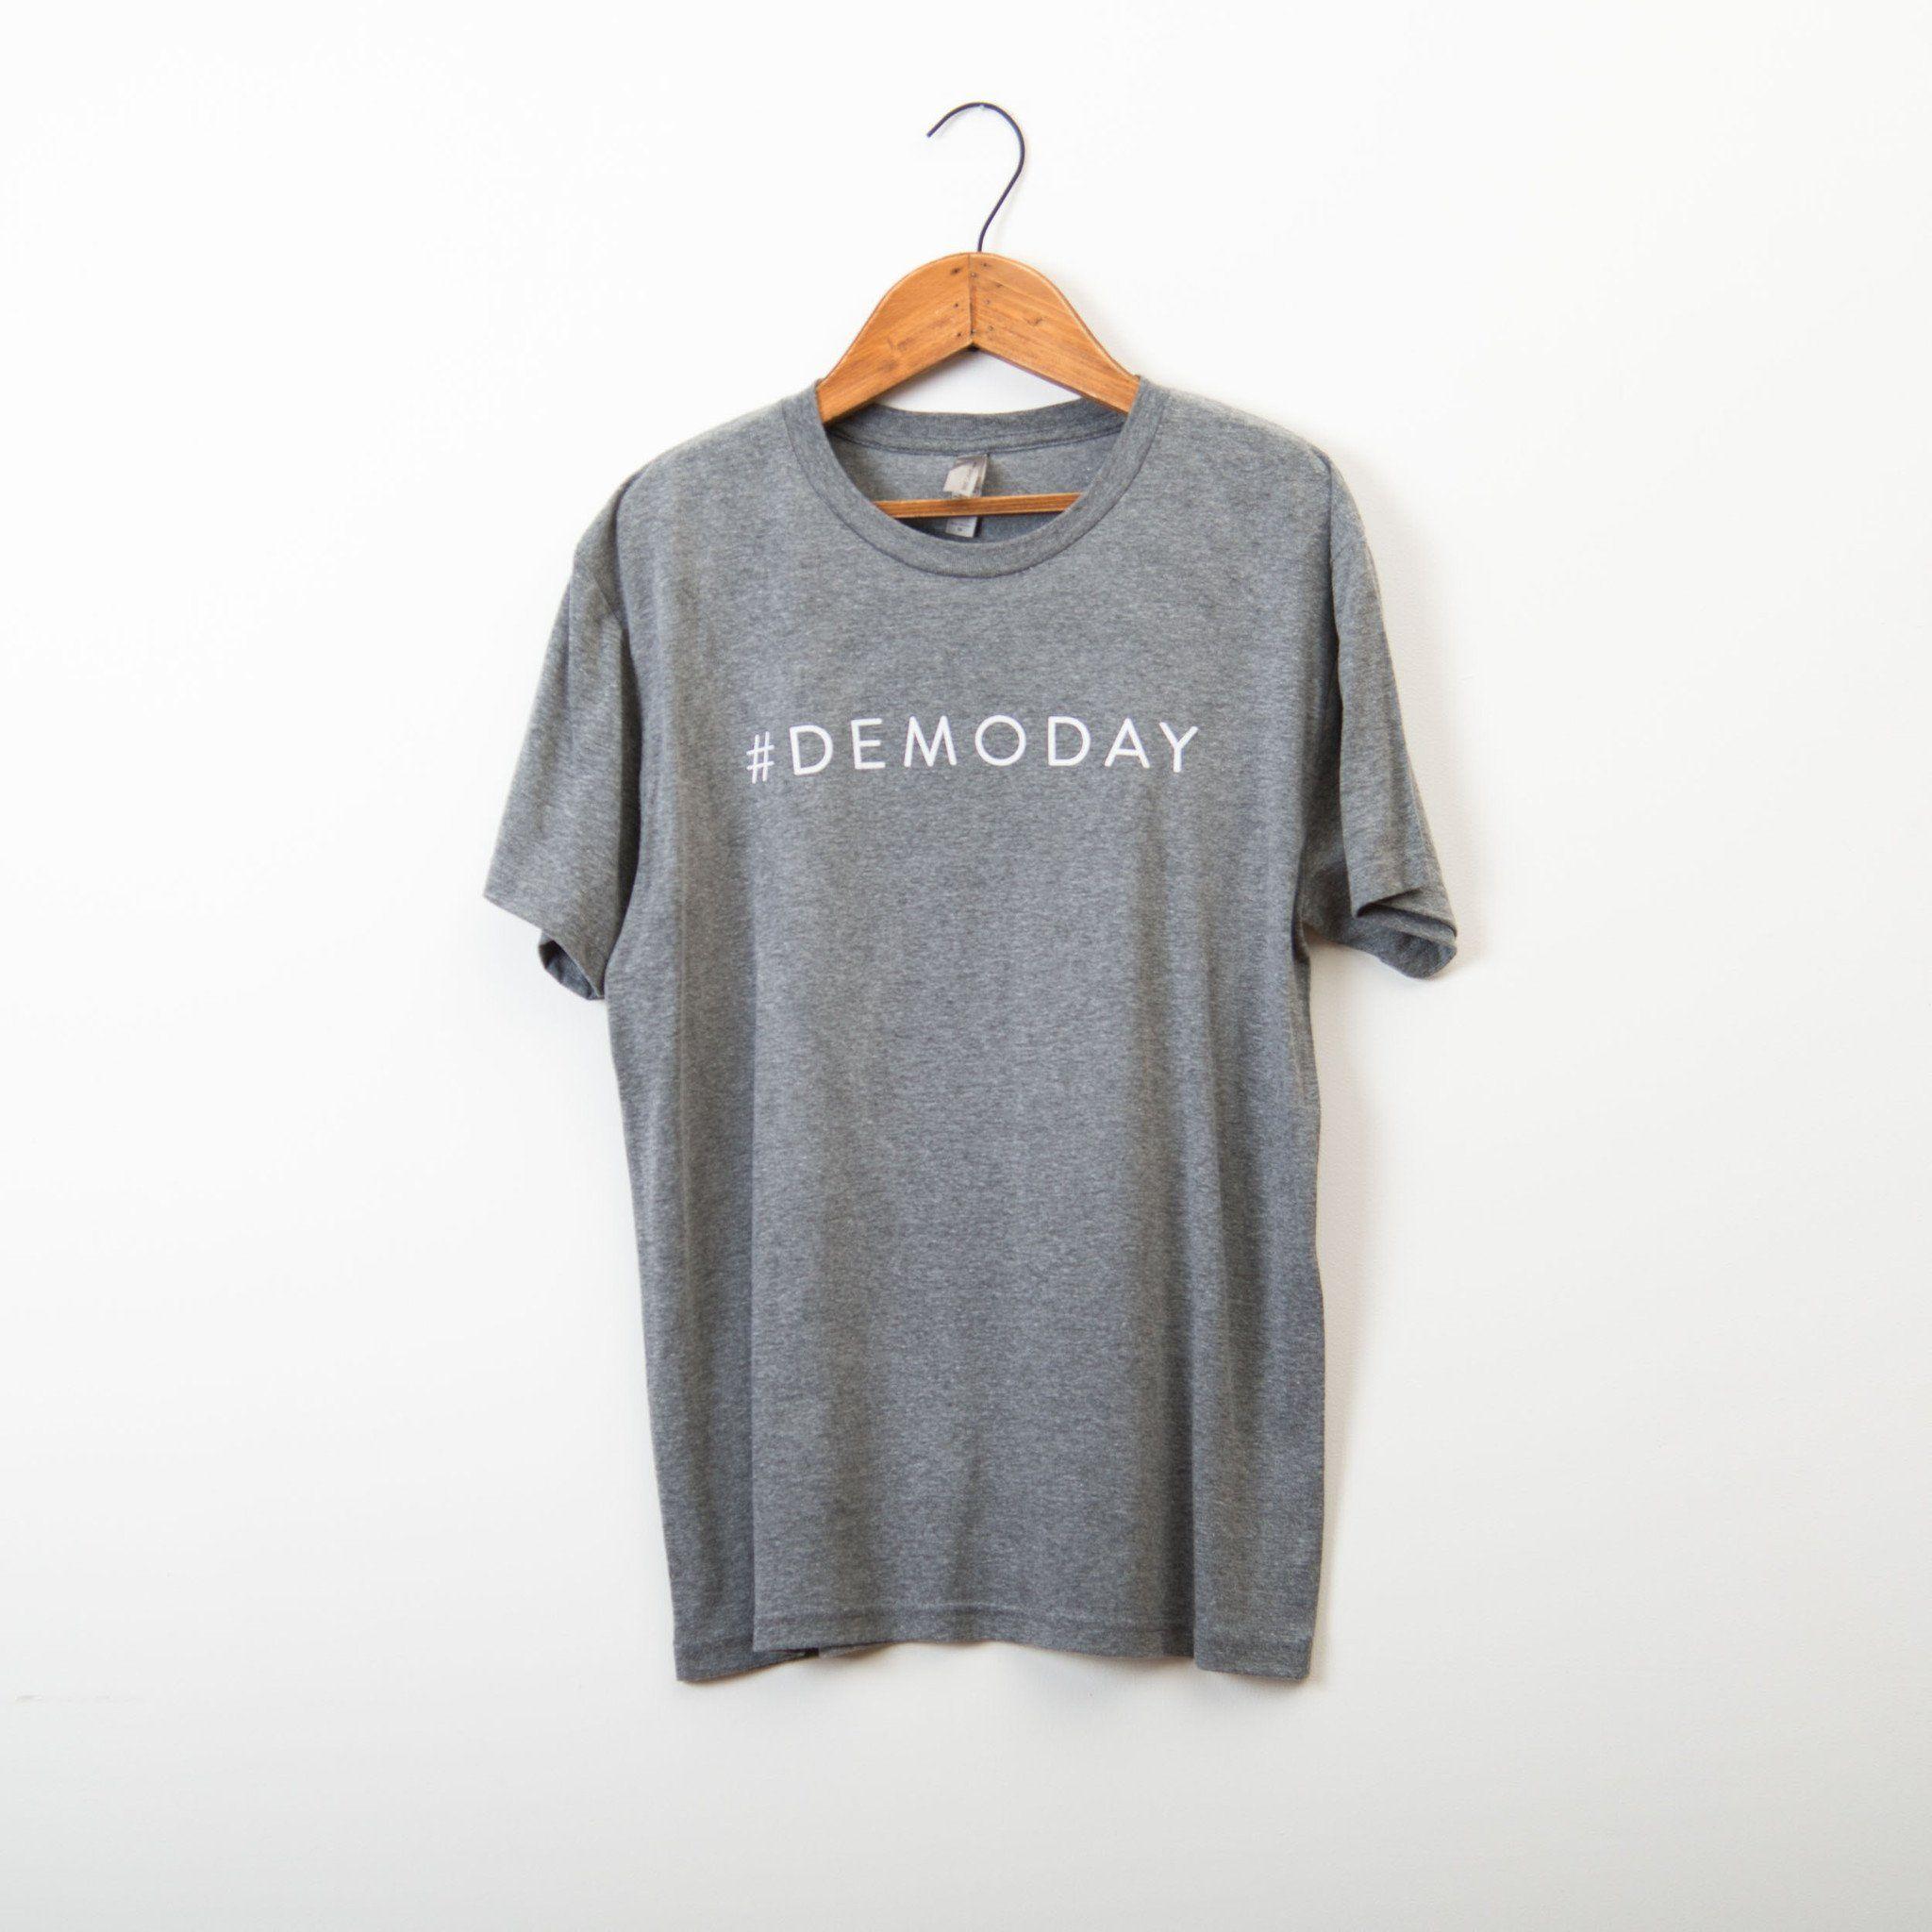 #DEMODAY Shirt #chipandjoannagainescostume